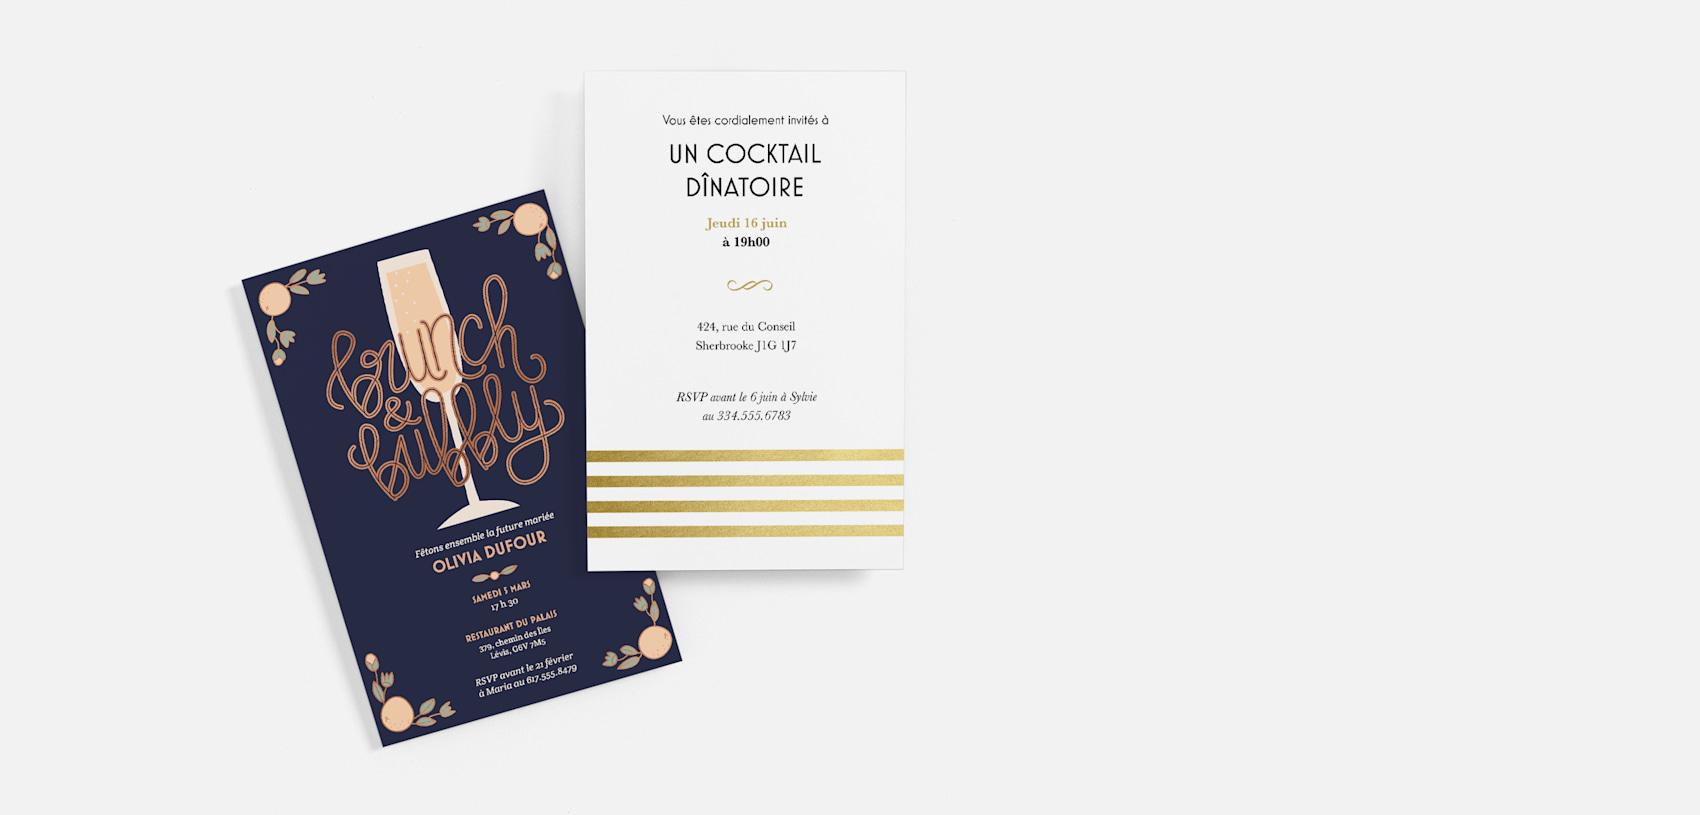 invitation à un déjeuner-dîner bleu marine et invitation à un souper blanche et dorée